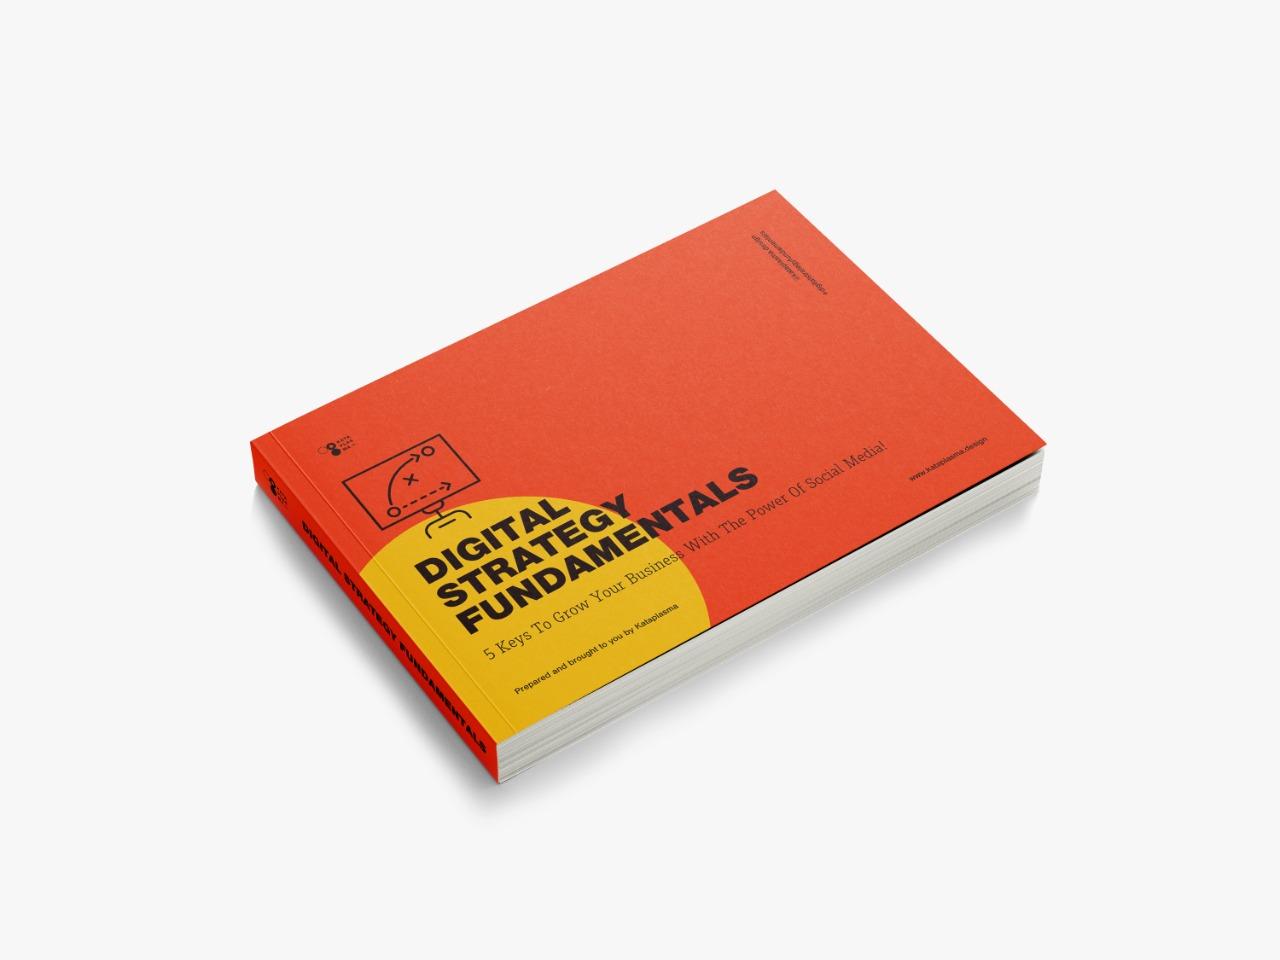 Digital Strategy Fundamentals Ebook by Sebastian Lecona - 5 keys to grow your business with social media from Kataplasma